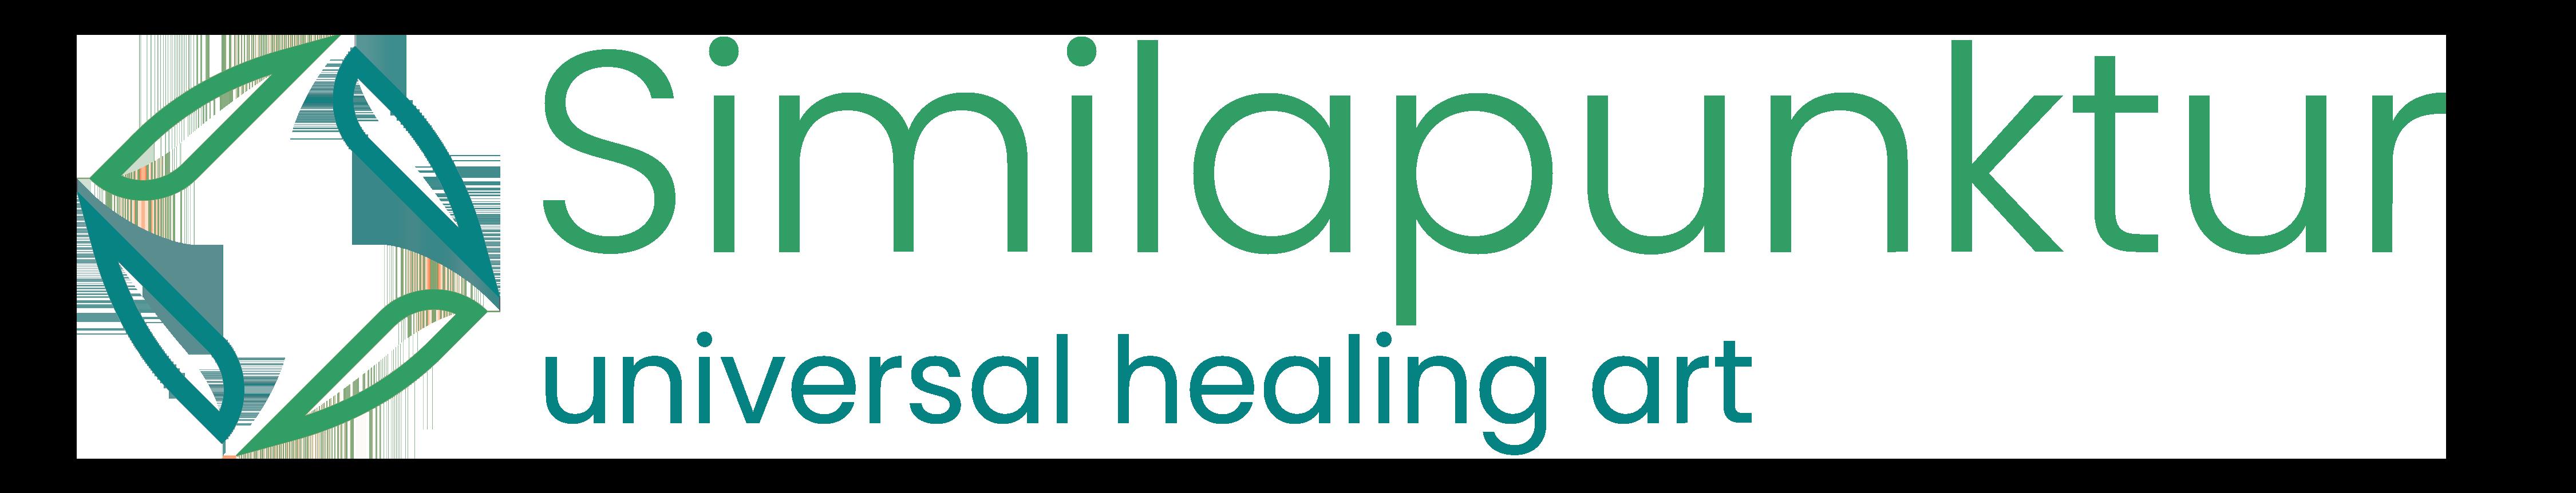 Similapunktur